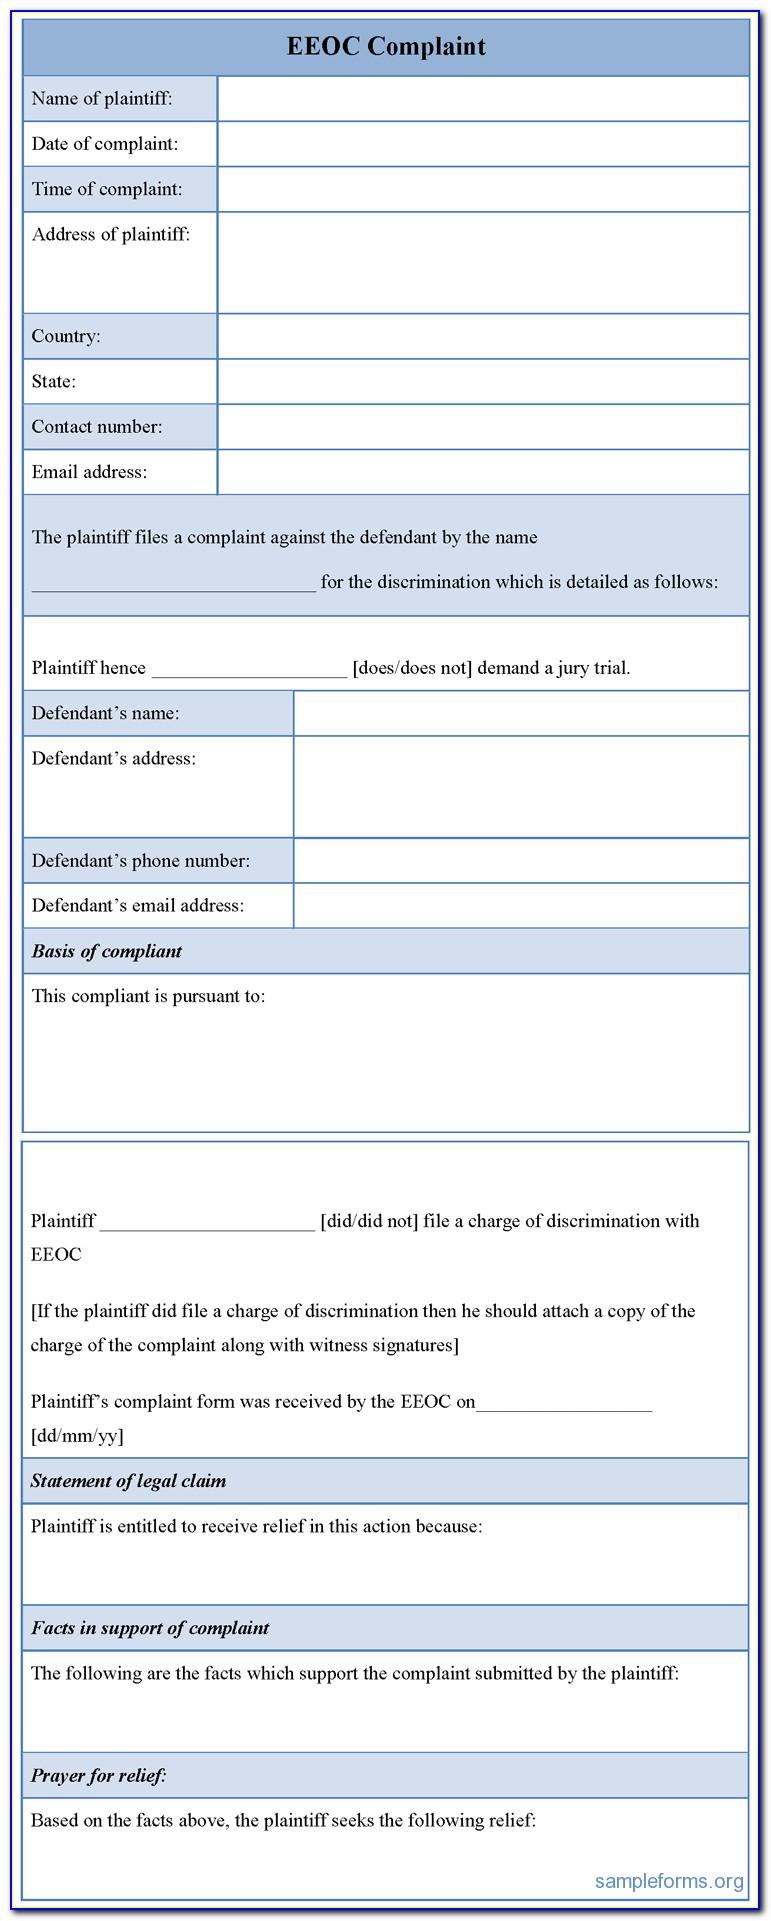 Eeoc Complaint Form Download